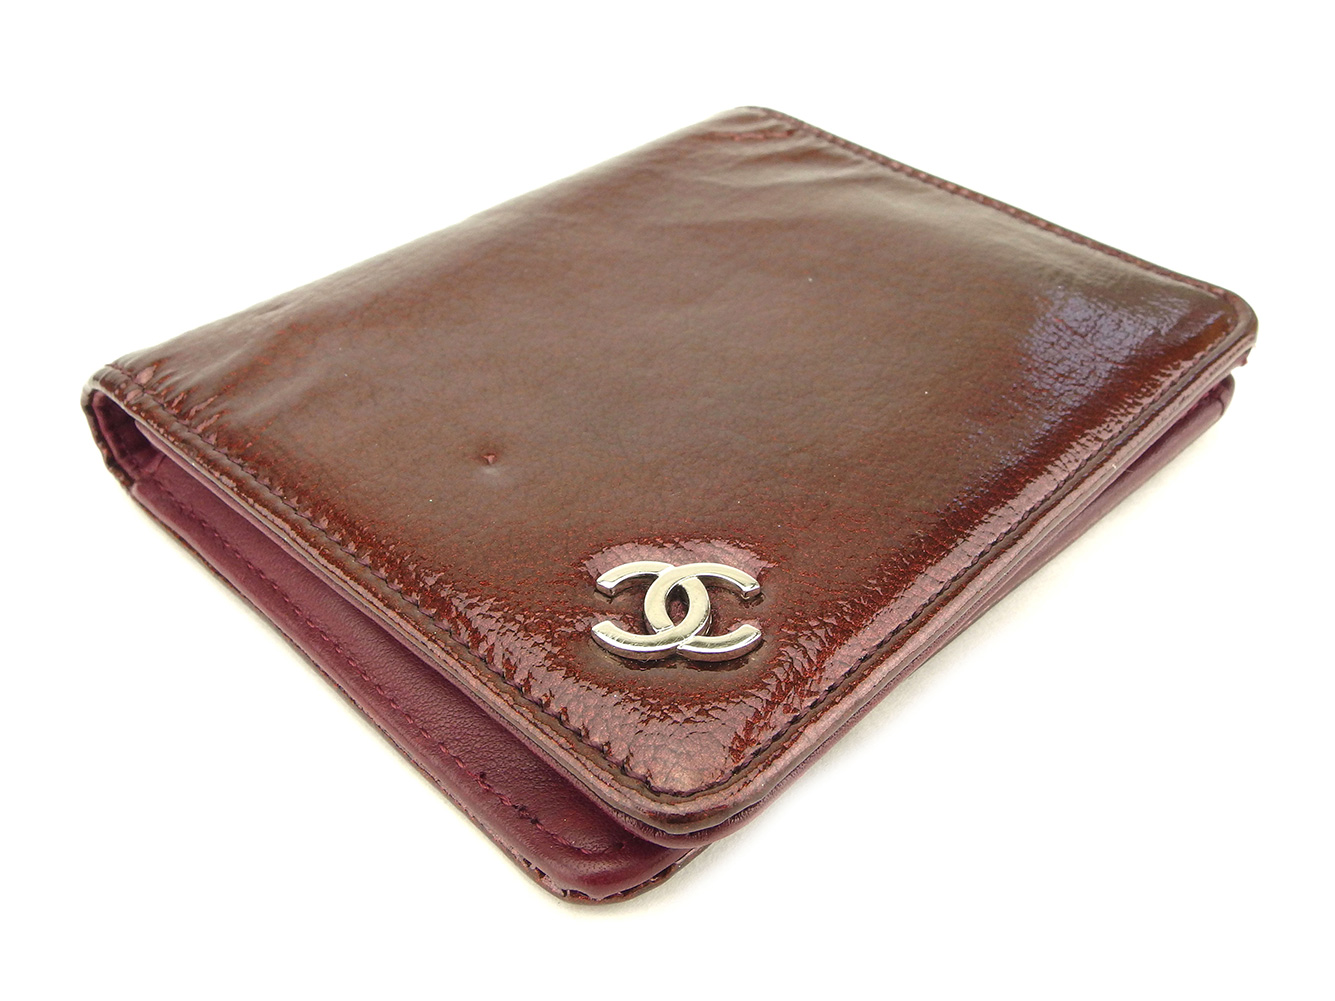 75f6e6d32e63 ブランド財布】 シャネル フェンディ CHANEL 二つ折り グッチ バッグ ...